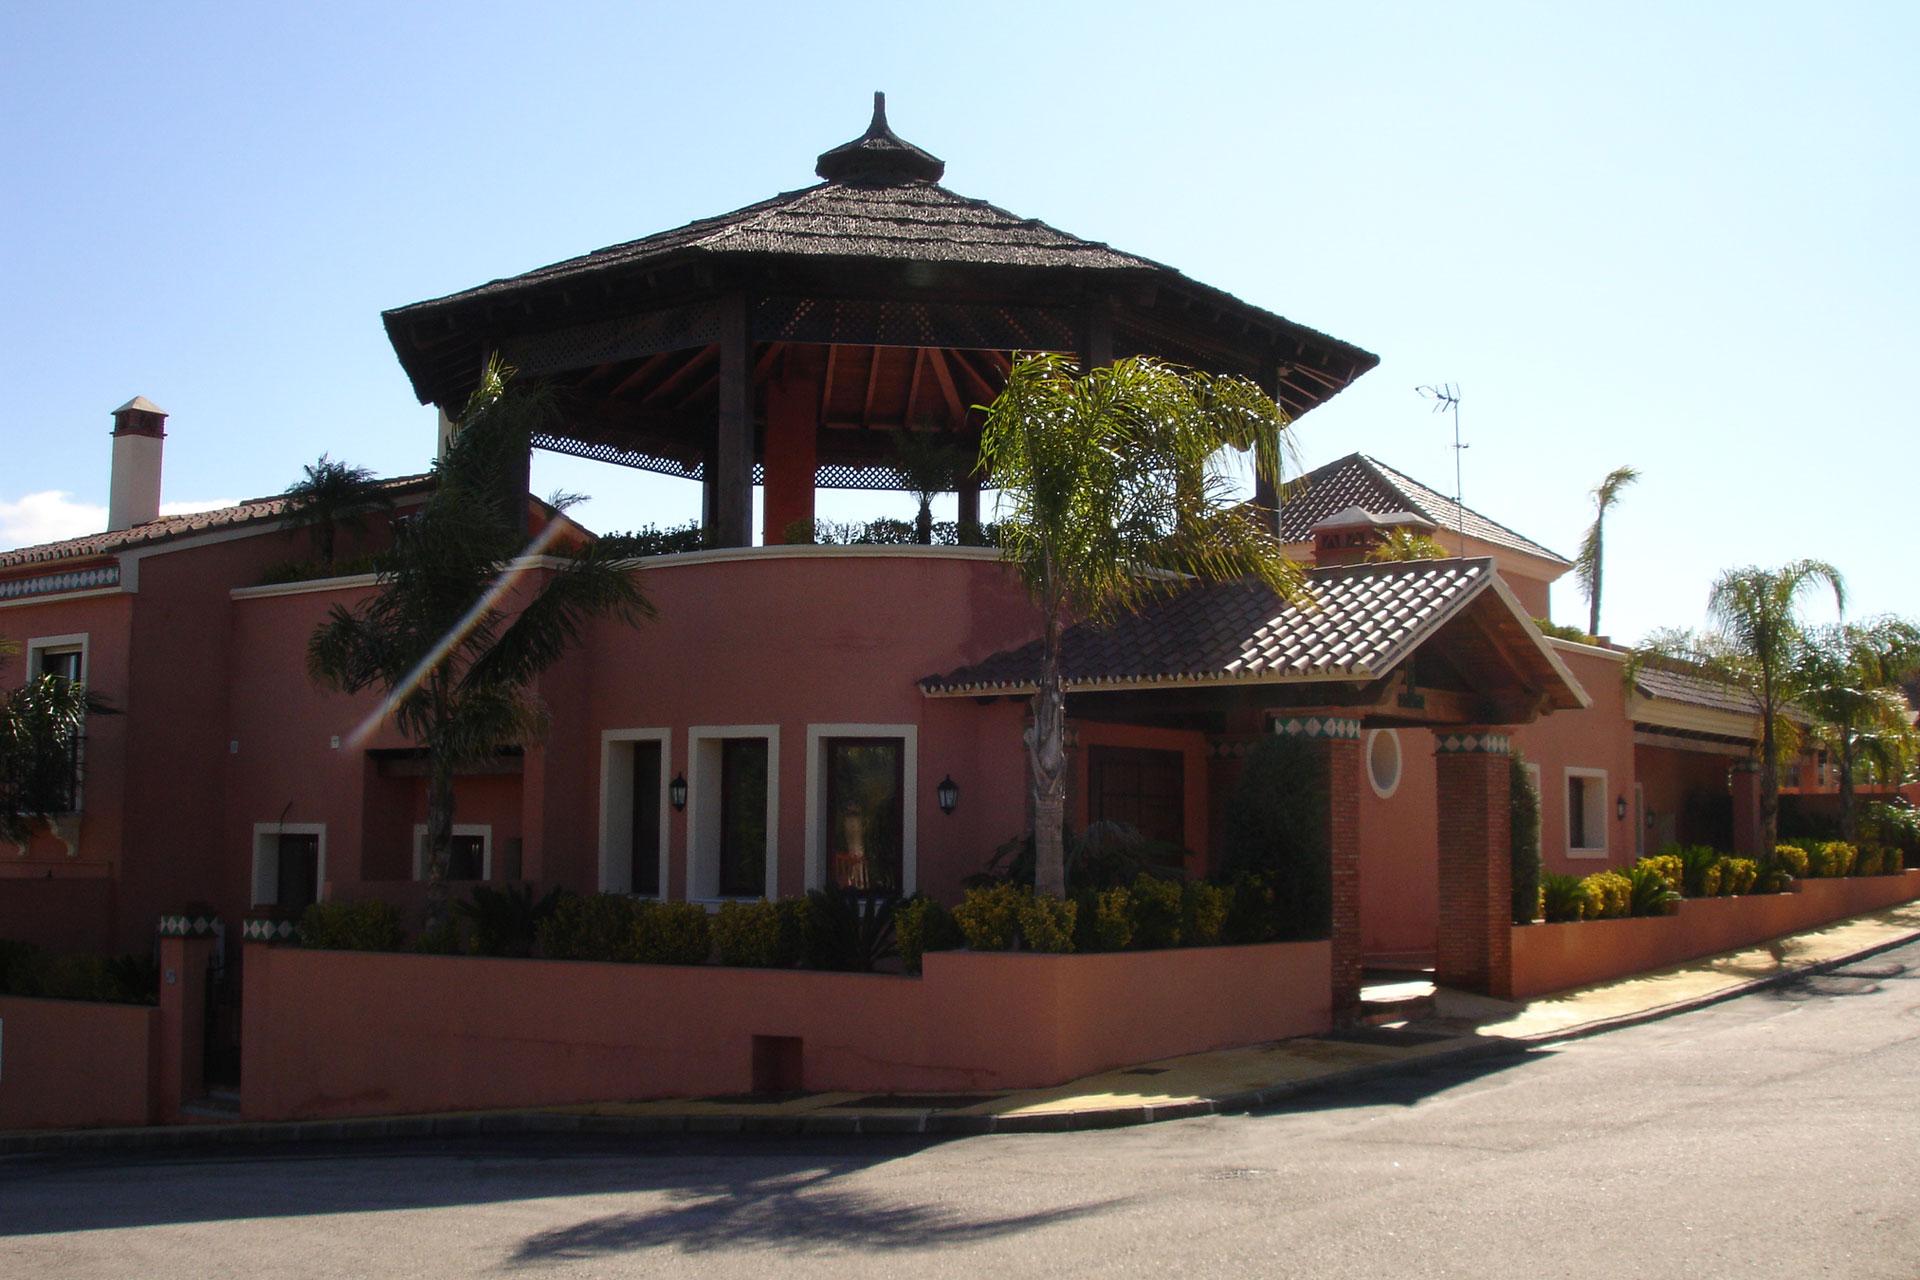 Business location for Restaurant, Urb. Los Nebrales